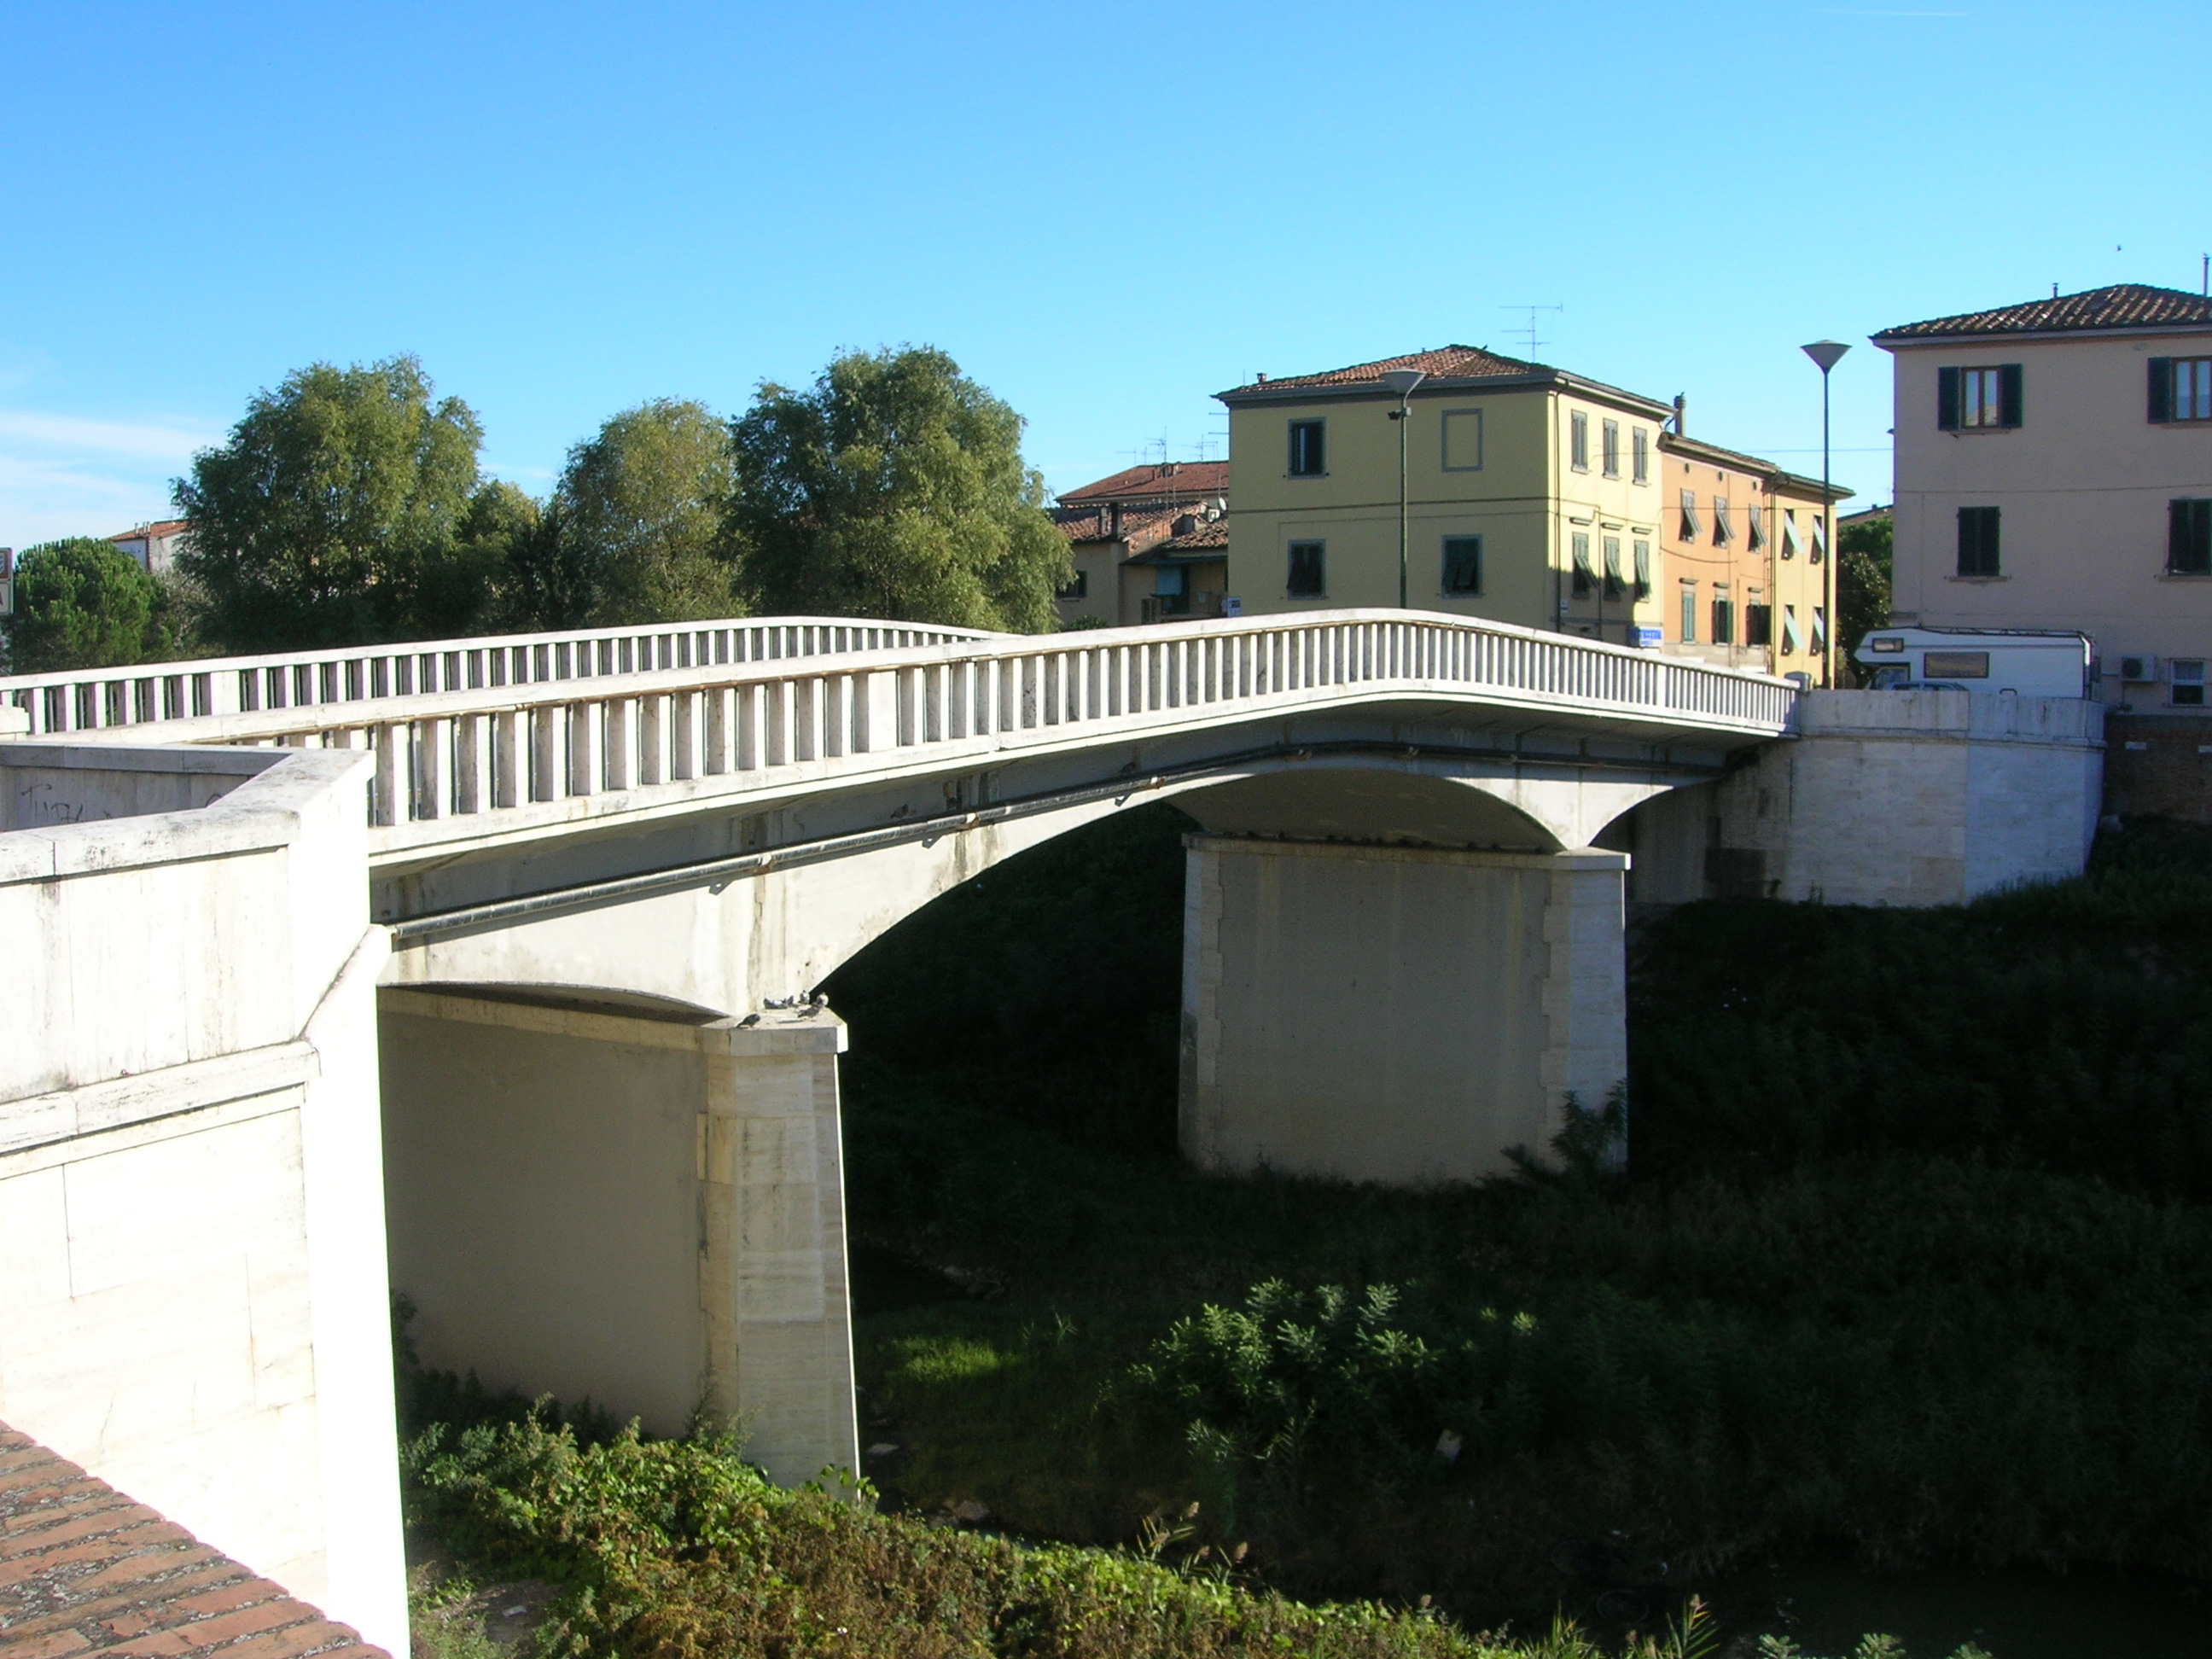 Pontedera Italy  city pictures gallery : Pontedera Ponte napoleonico visto da sud Wikipedia, the ...